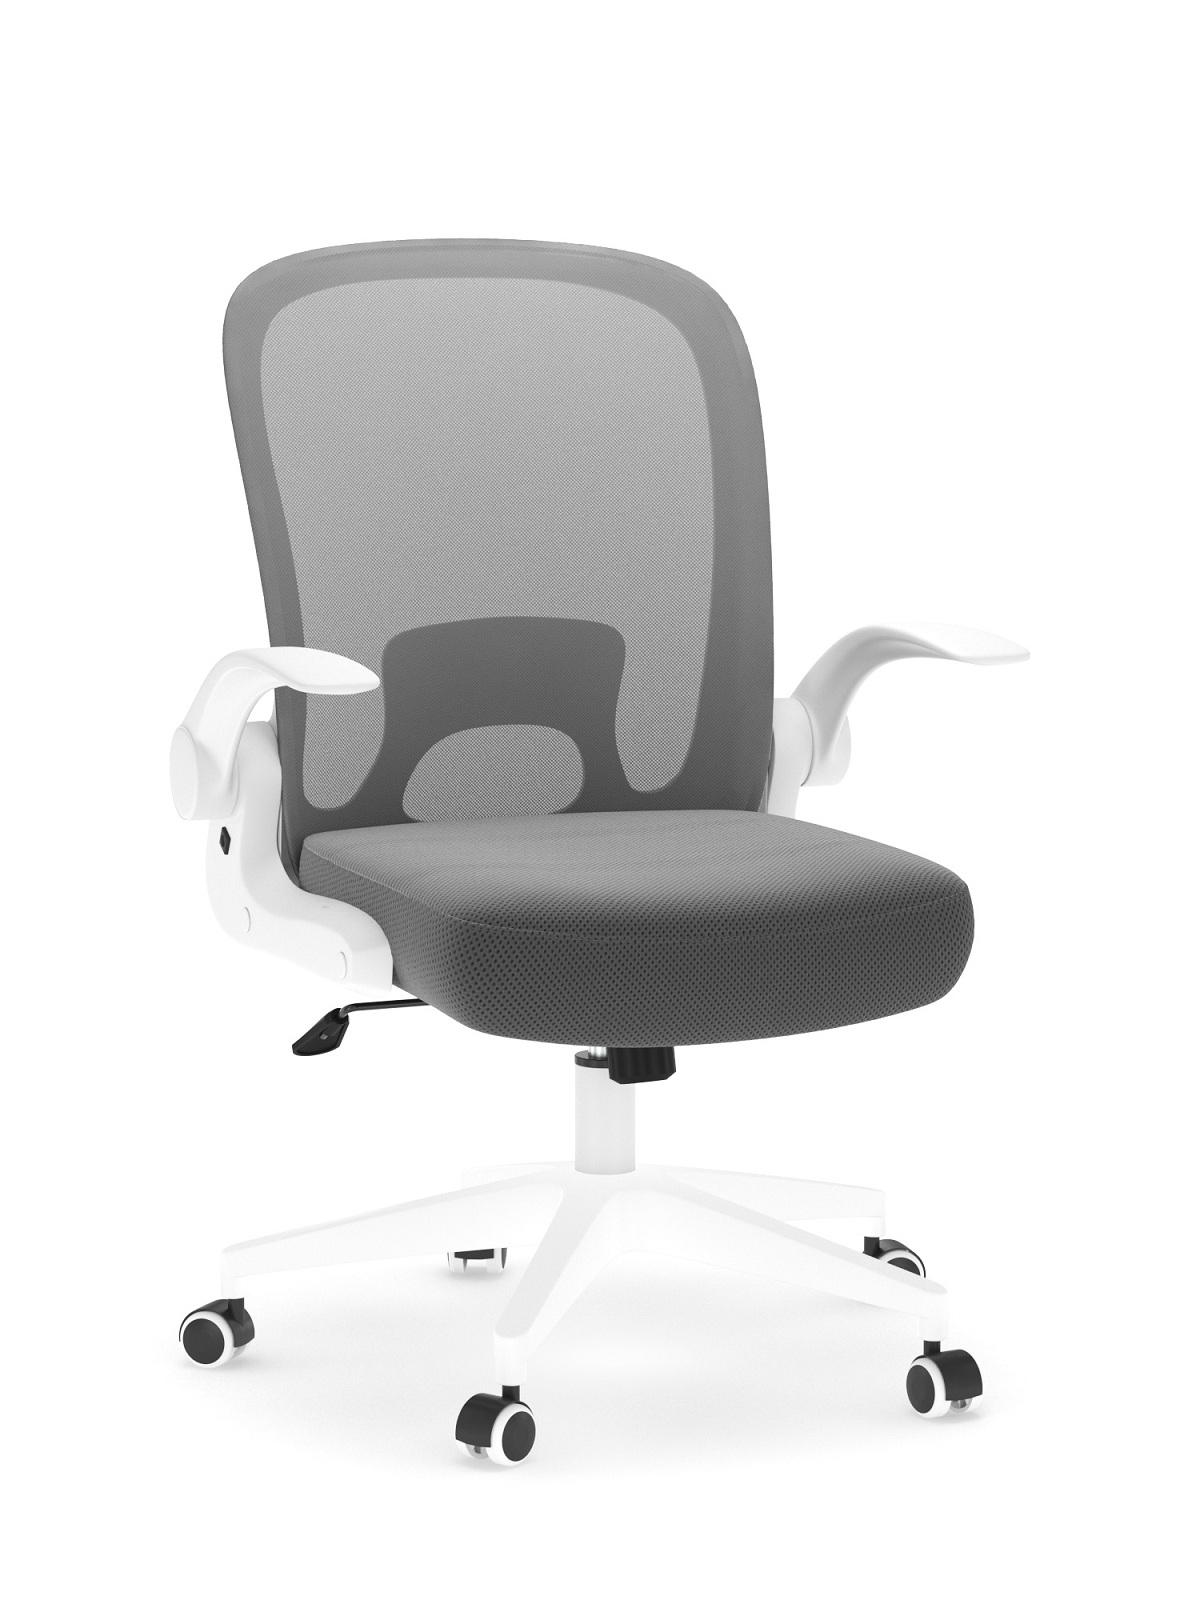 Офисное кресло Loftyhome Template gray VC6007 G